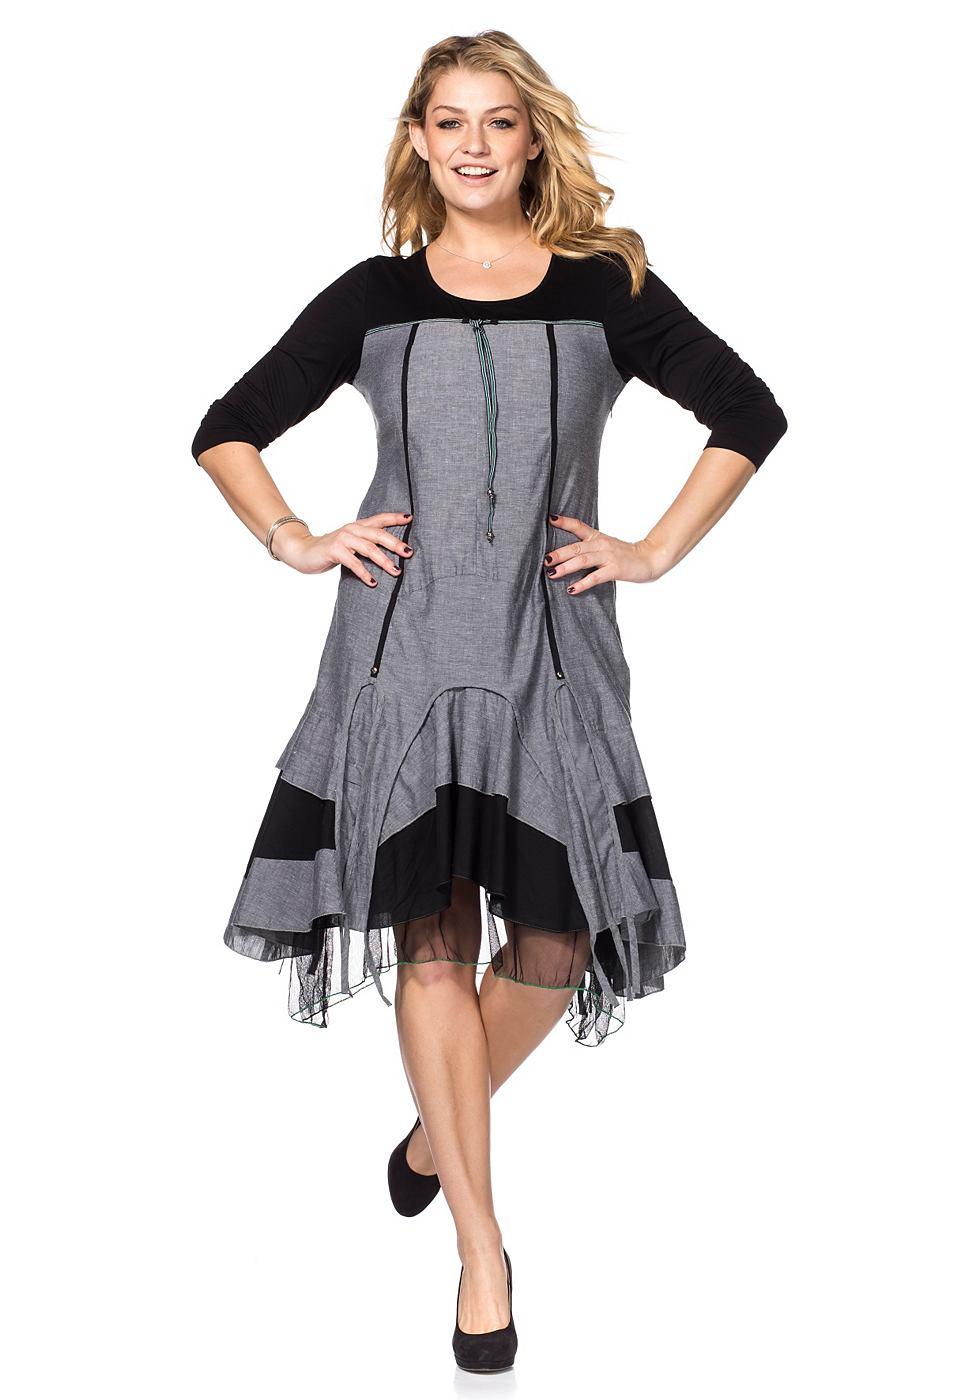 NU 21% KORTING: Joe Browns jurk grijs